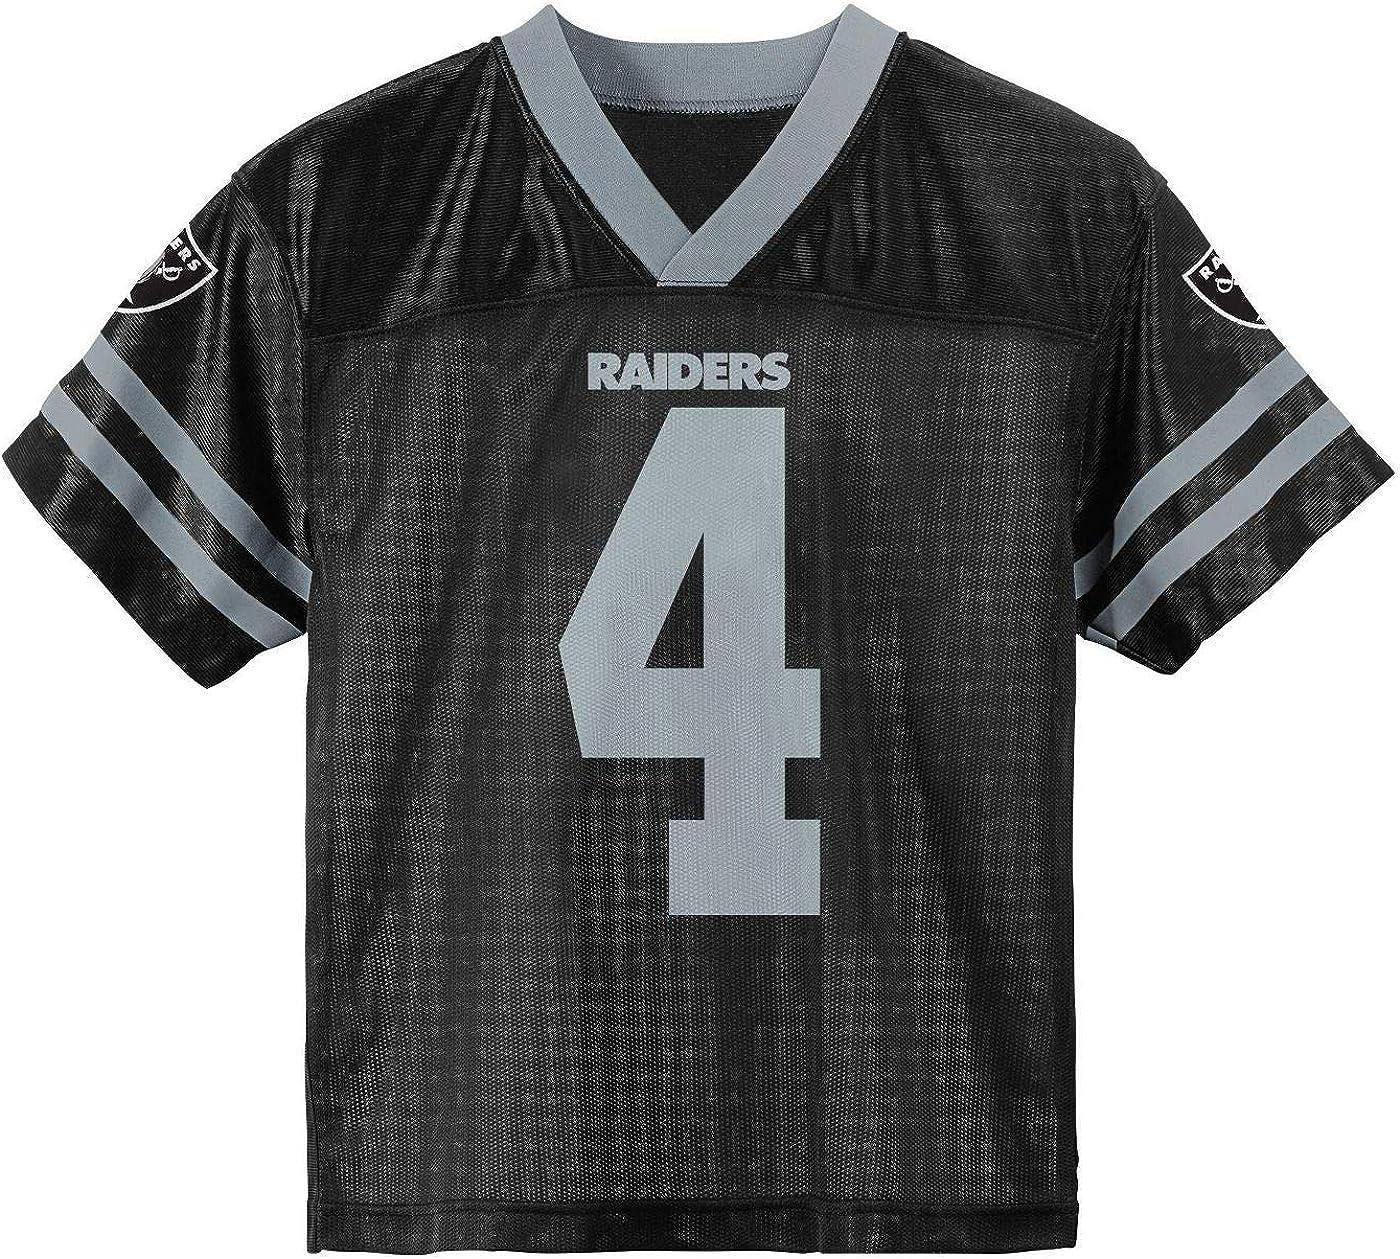 Derek Carr Las Vegas Raiders Black #4 Youth 4-20 Home Player Jersey